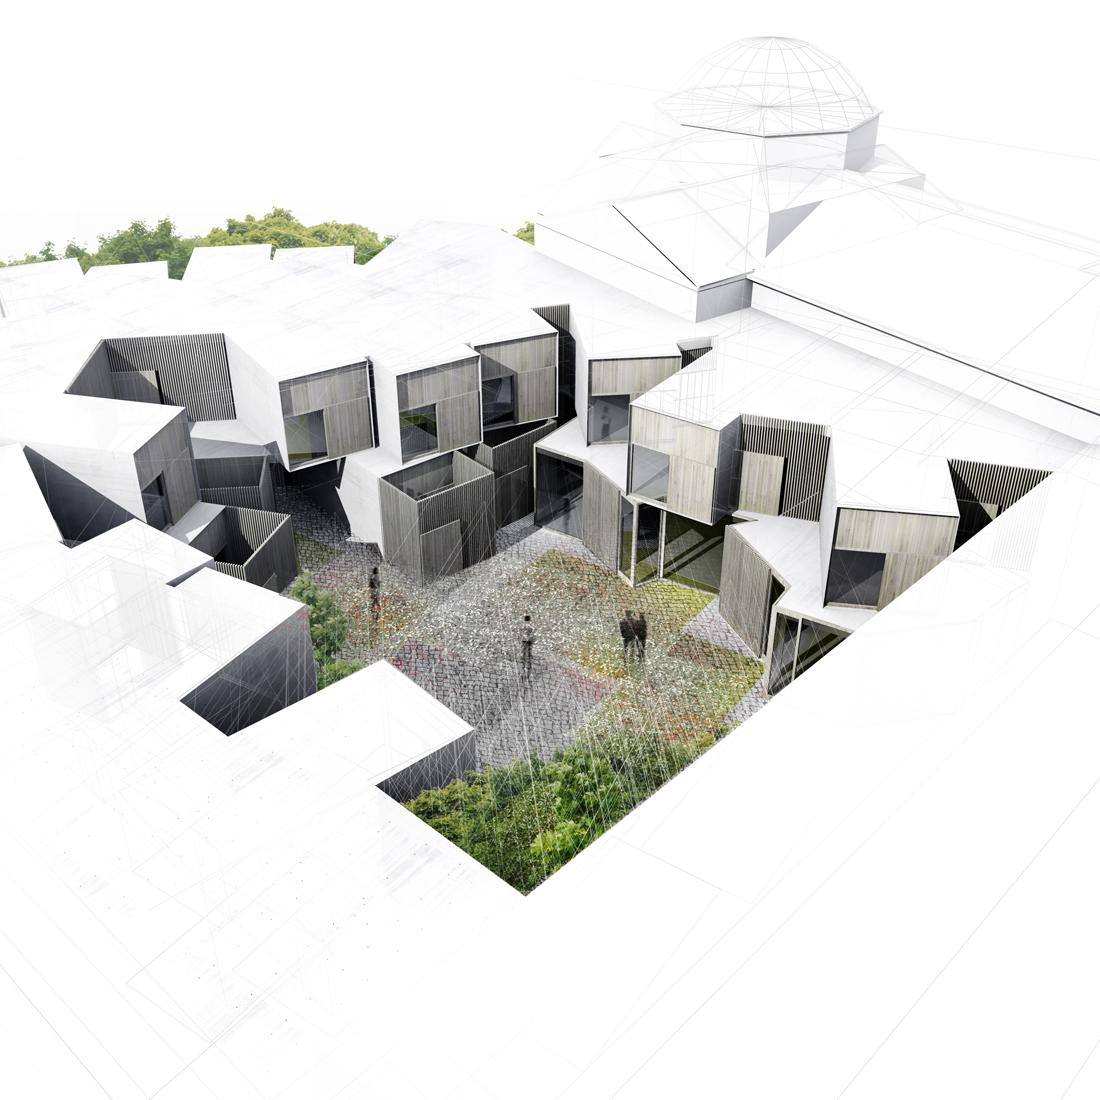 Amann c novas maruri hospeder a en extremadura hic for The concept of space in mamluk architecture